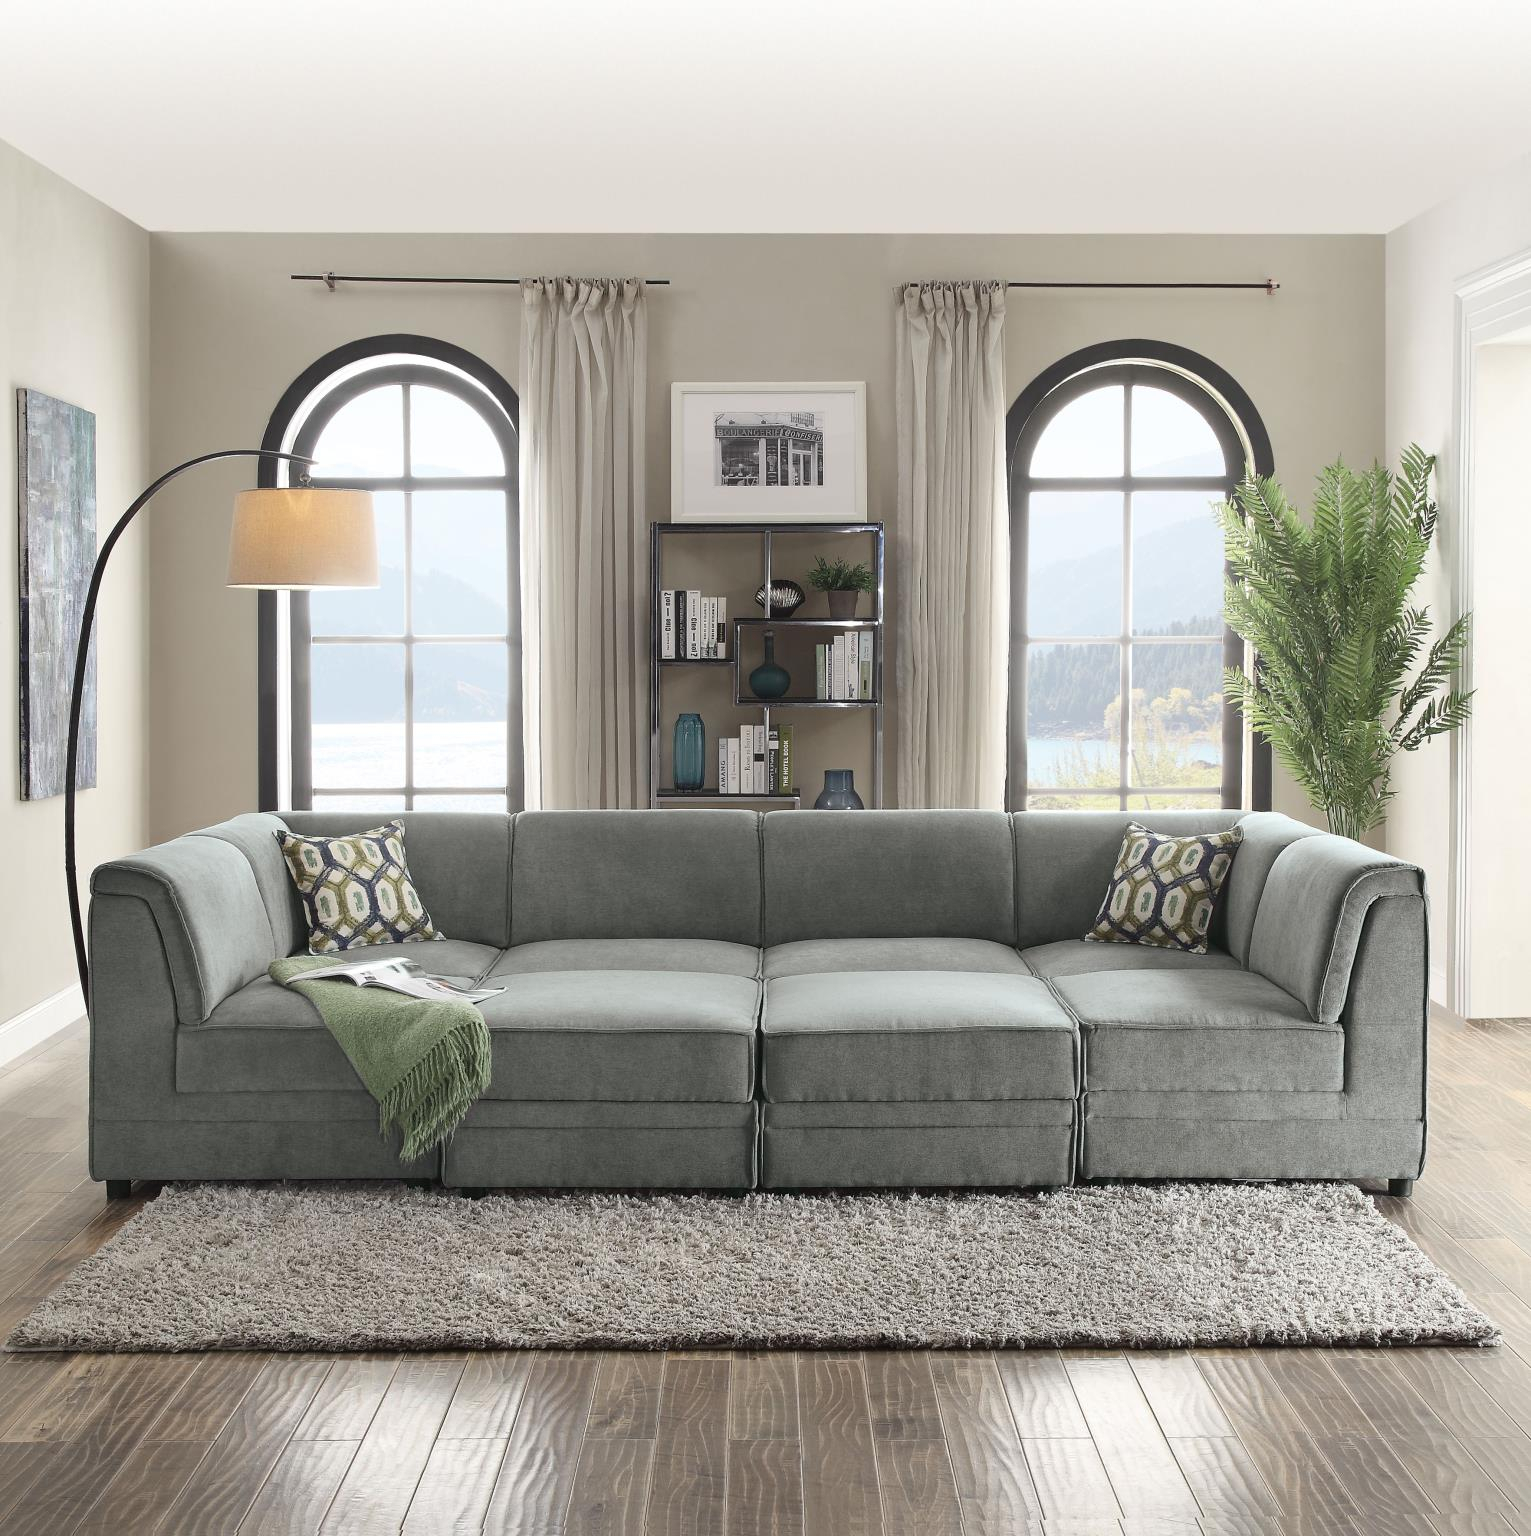 Bois I Modular Convertible Sectional Sofa Throughout Convertible Sofas (View 15 of 15)